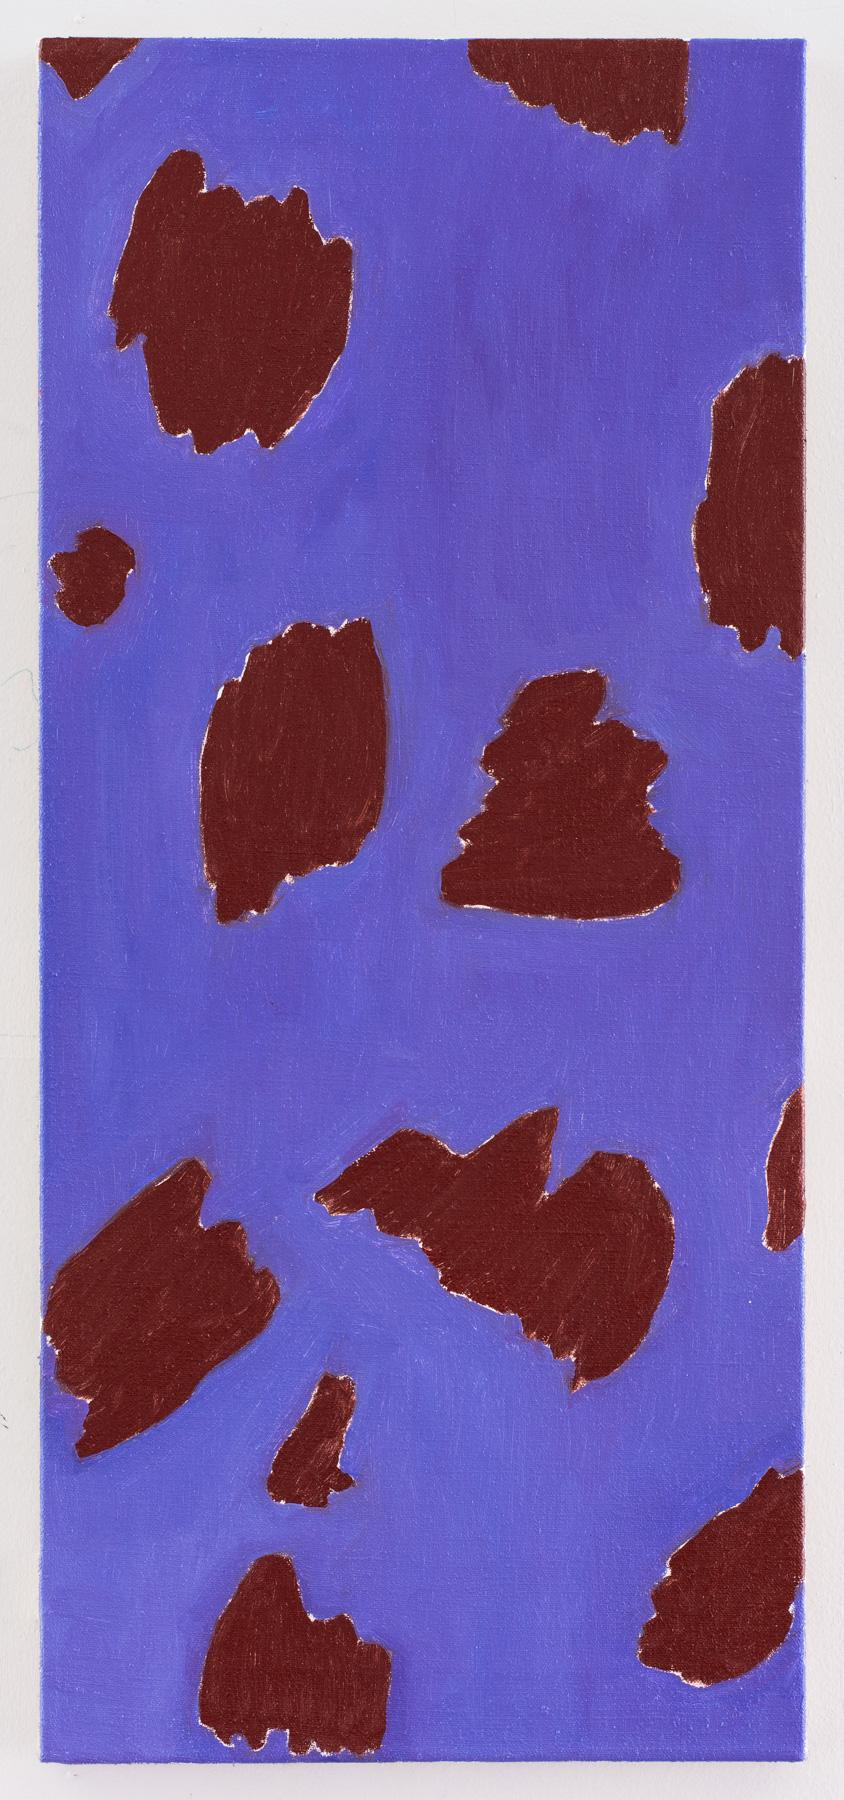 "Nora Griffin Topaz, 2017, Oil on linen 27 x 12"""